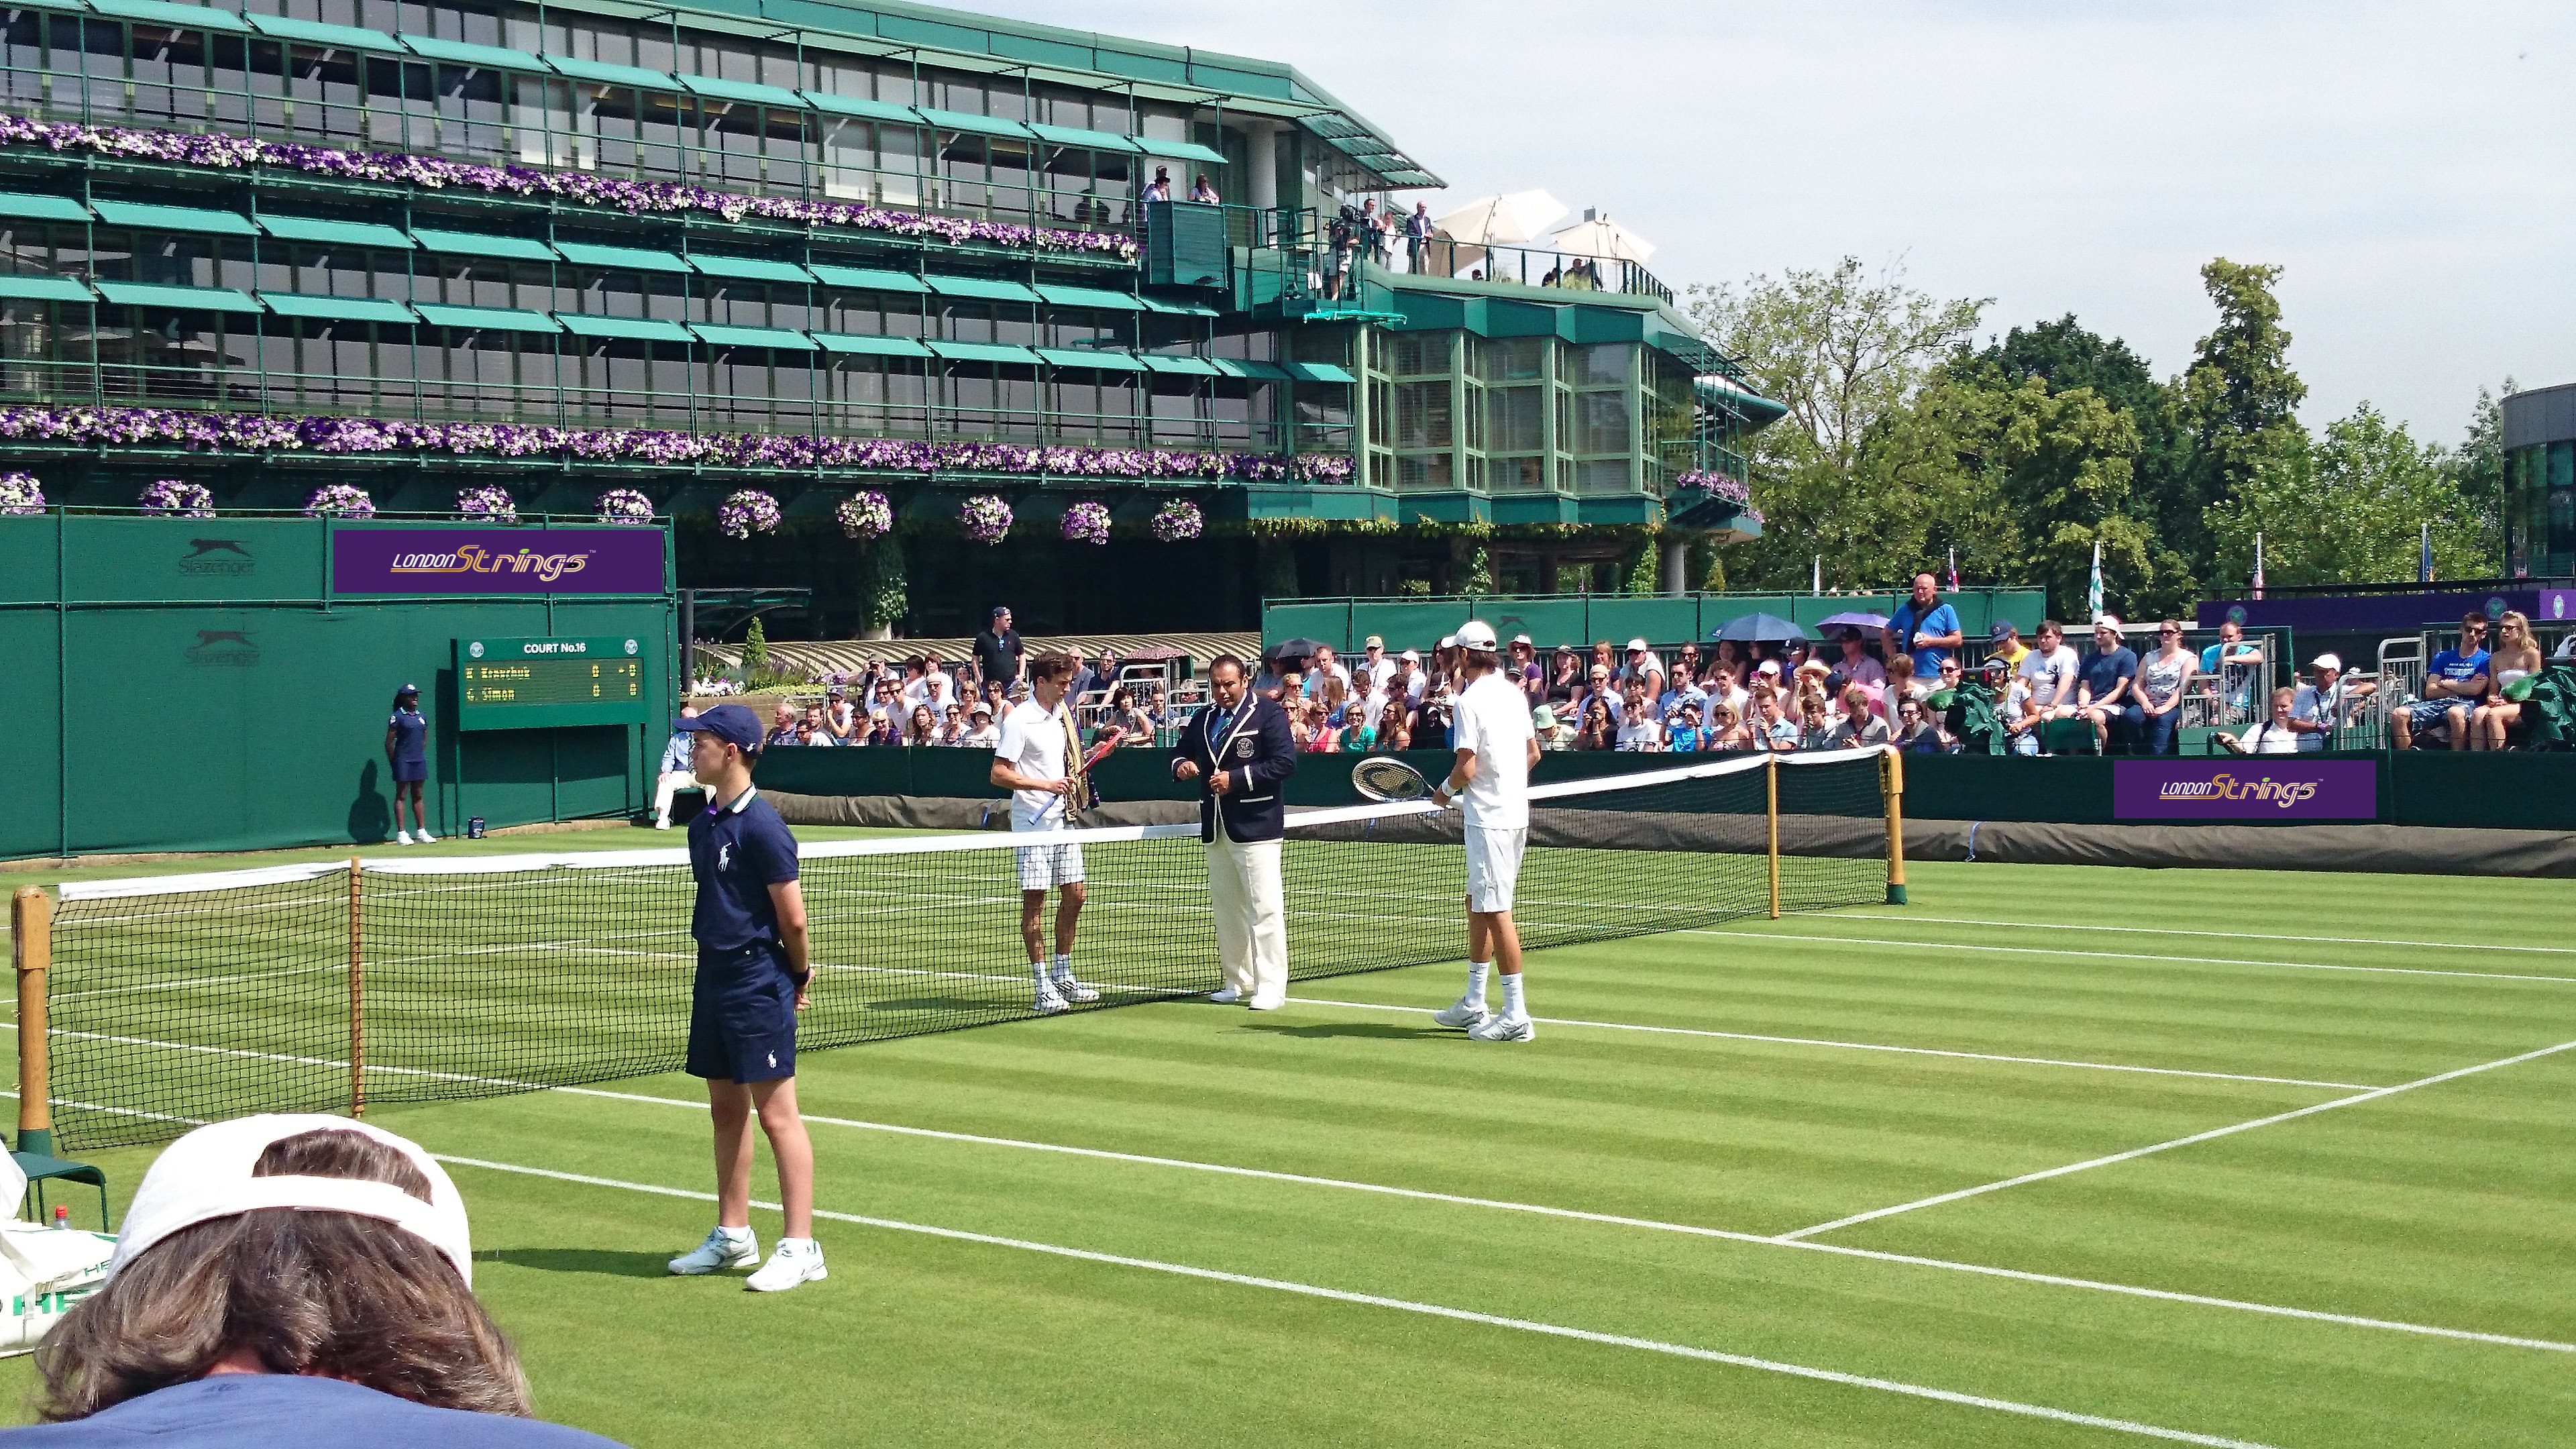 London_Strings Racket Restringing, London EC2, Wimbledon Photo